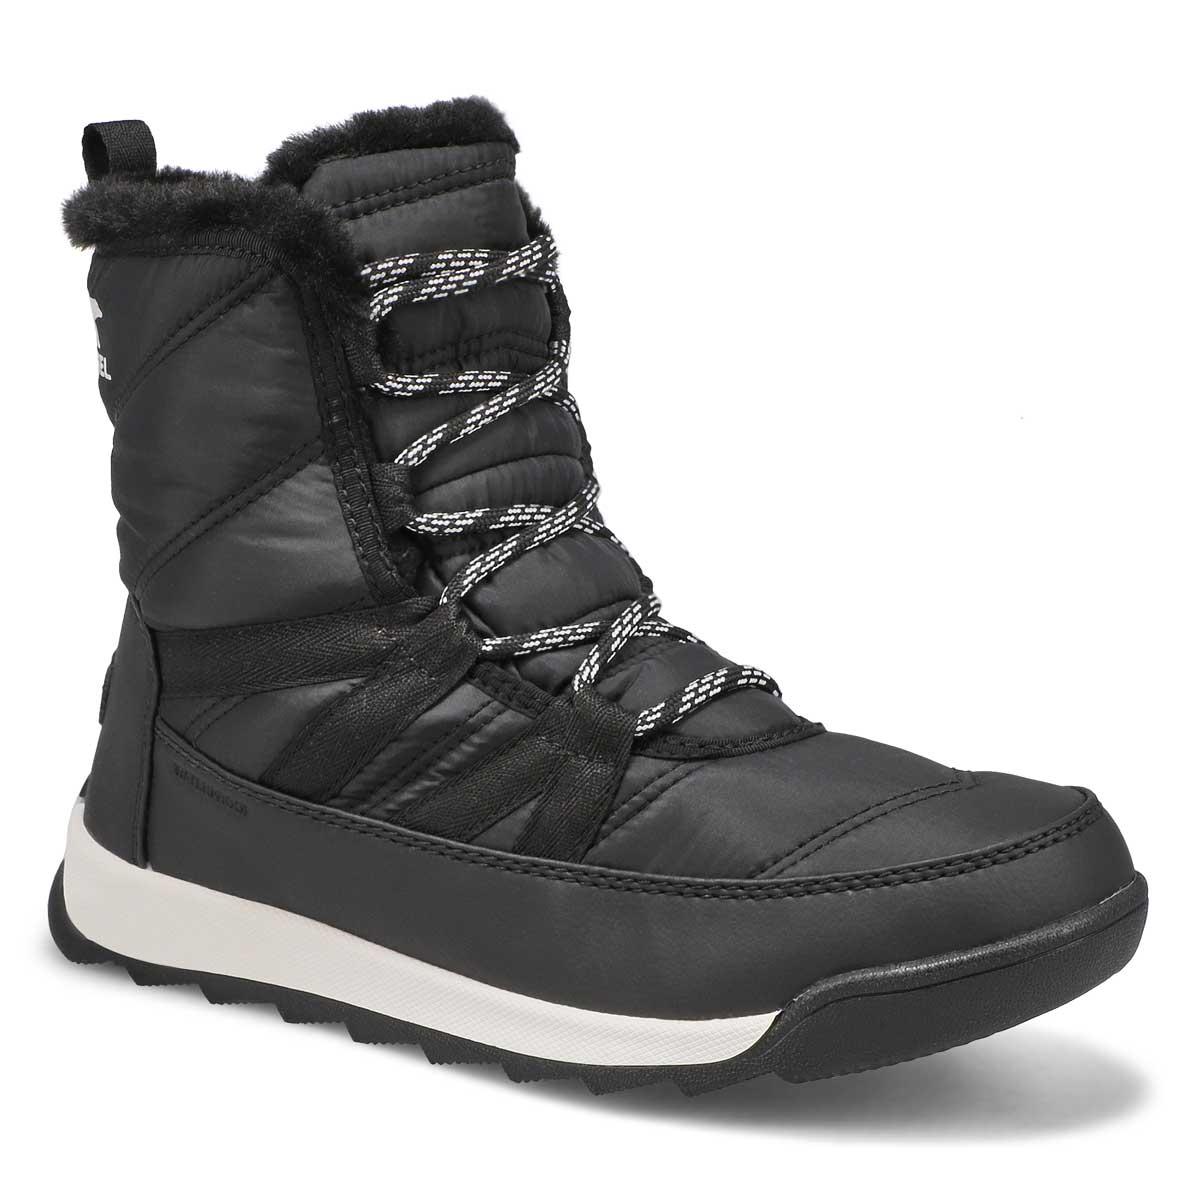 Lds Whitney II Short blk wp winter boot